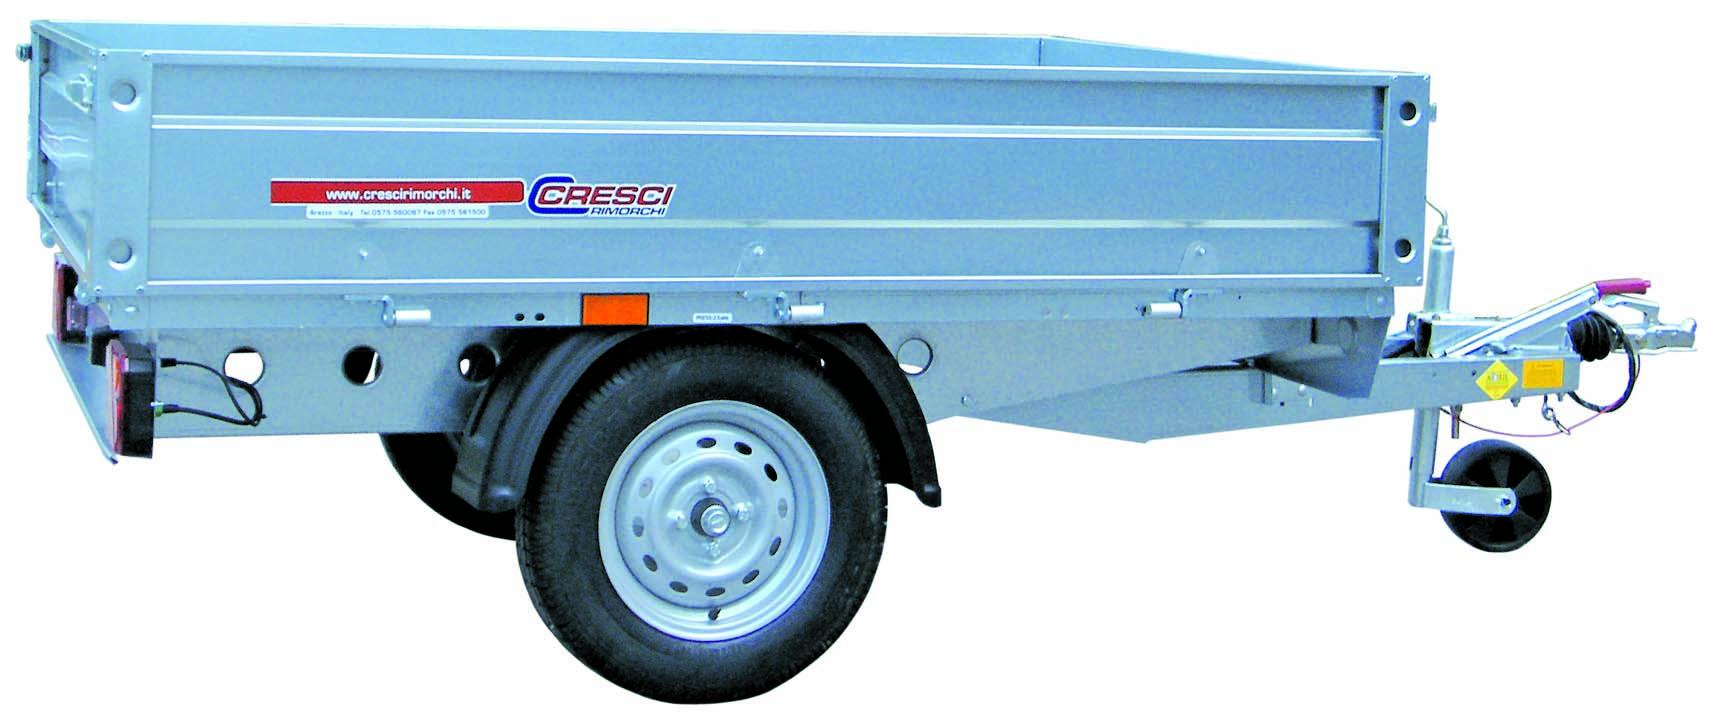 Carrello cresci a6l 750 sp aprib 201x147x34 for Carrello cresci a6